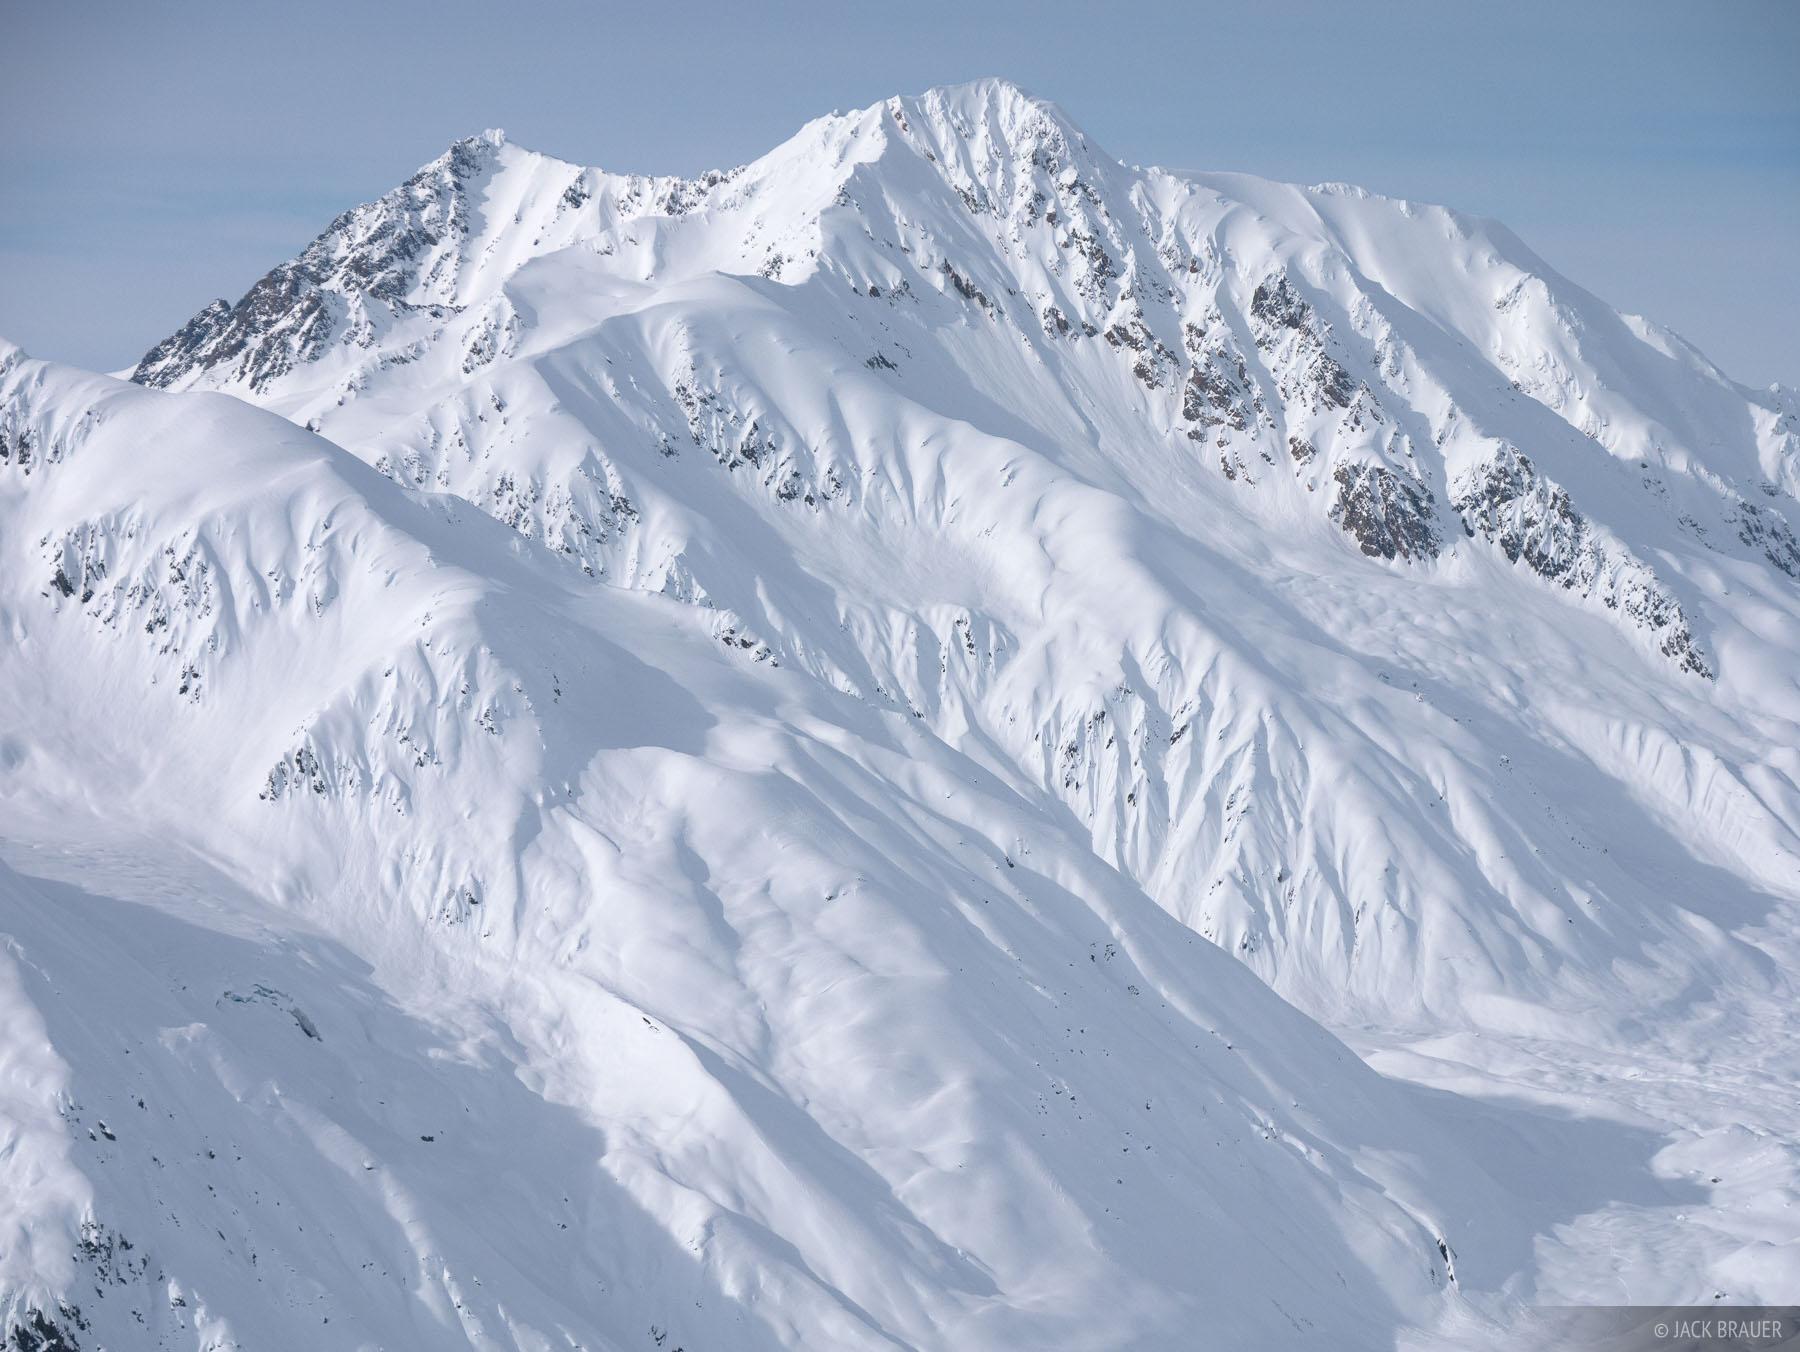 Alaska, Haines, Takhinsha Mountains, March, Takhinsha, winter, 2016